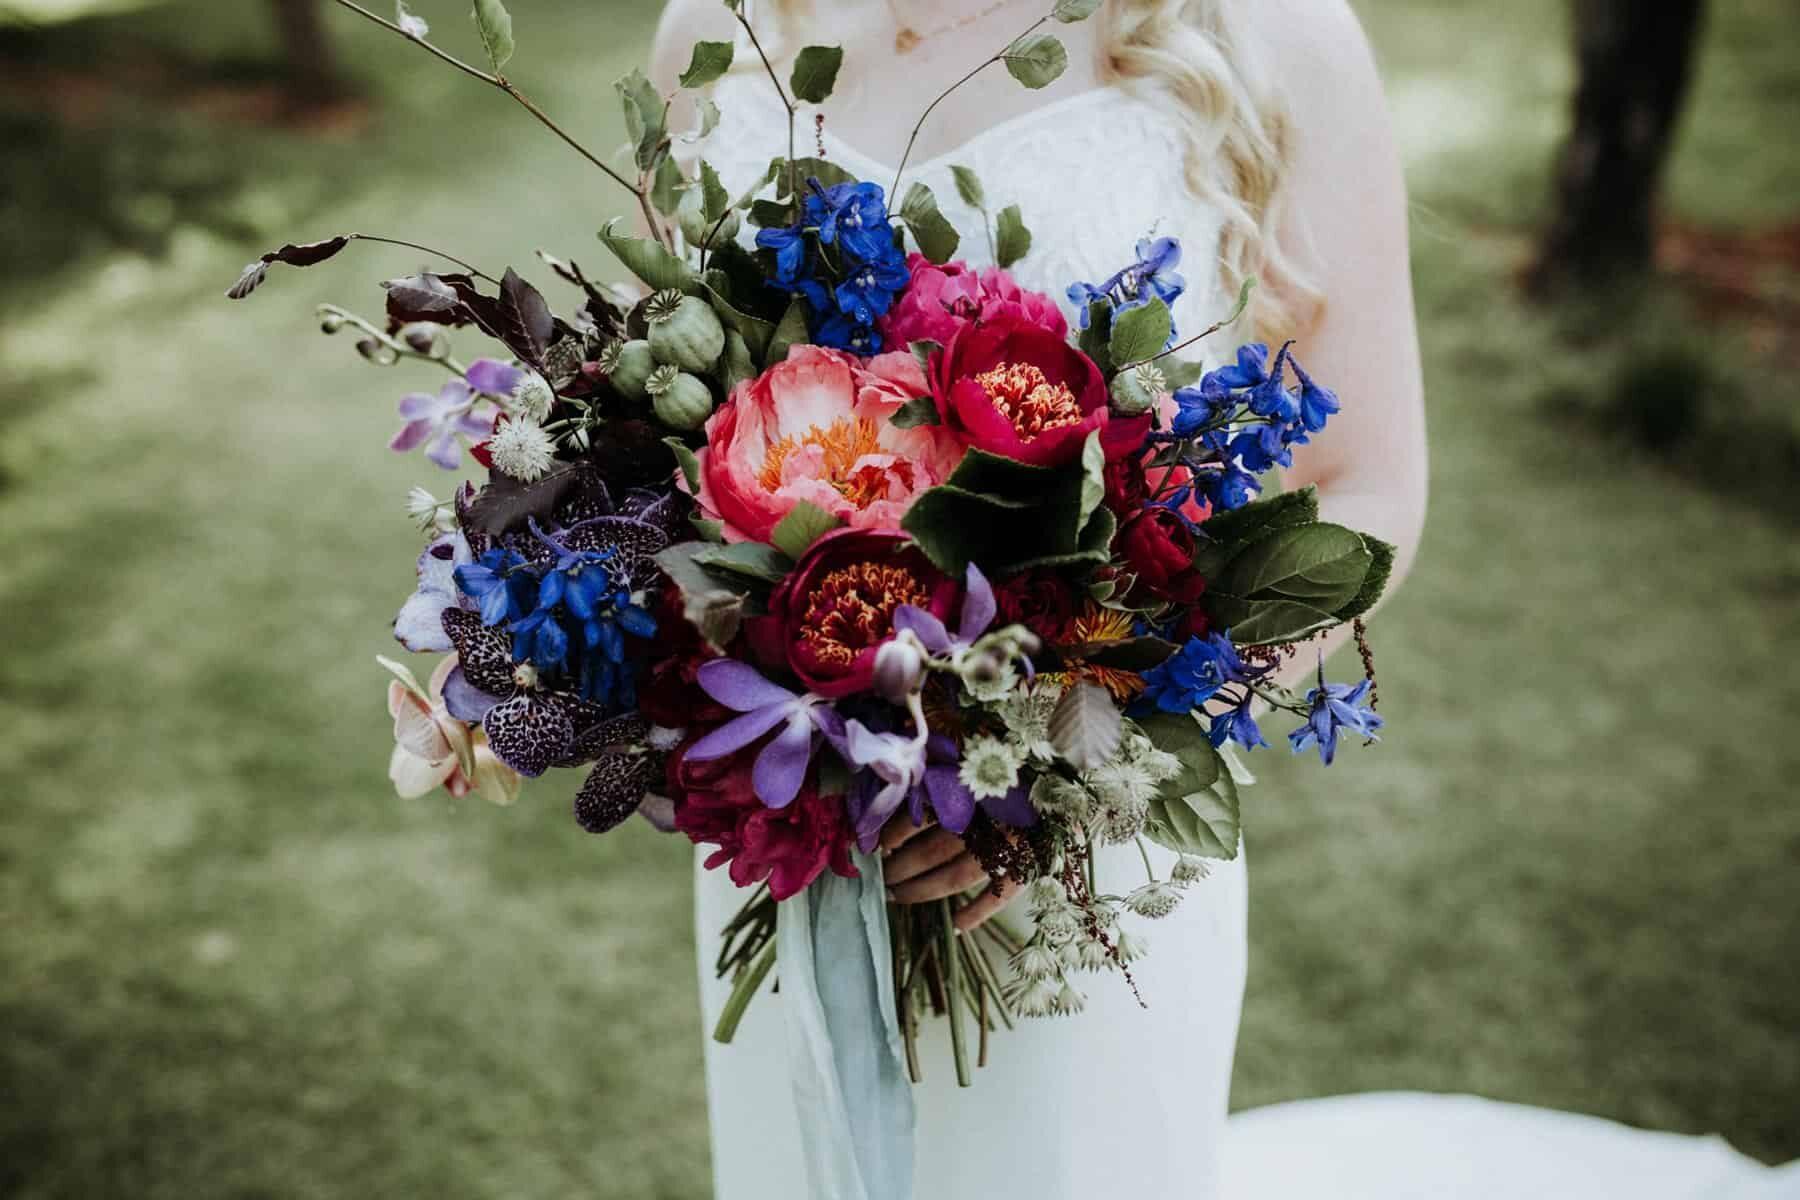 jewel-toned bridal bouquet